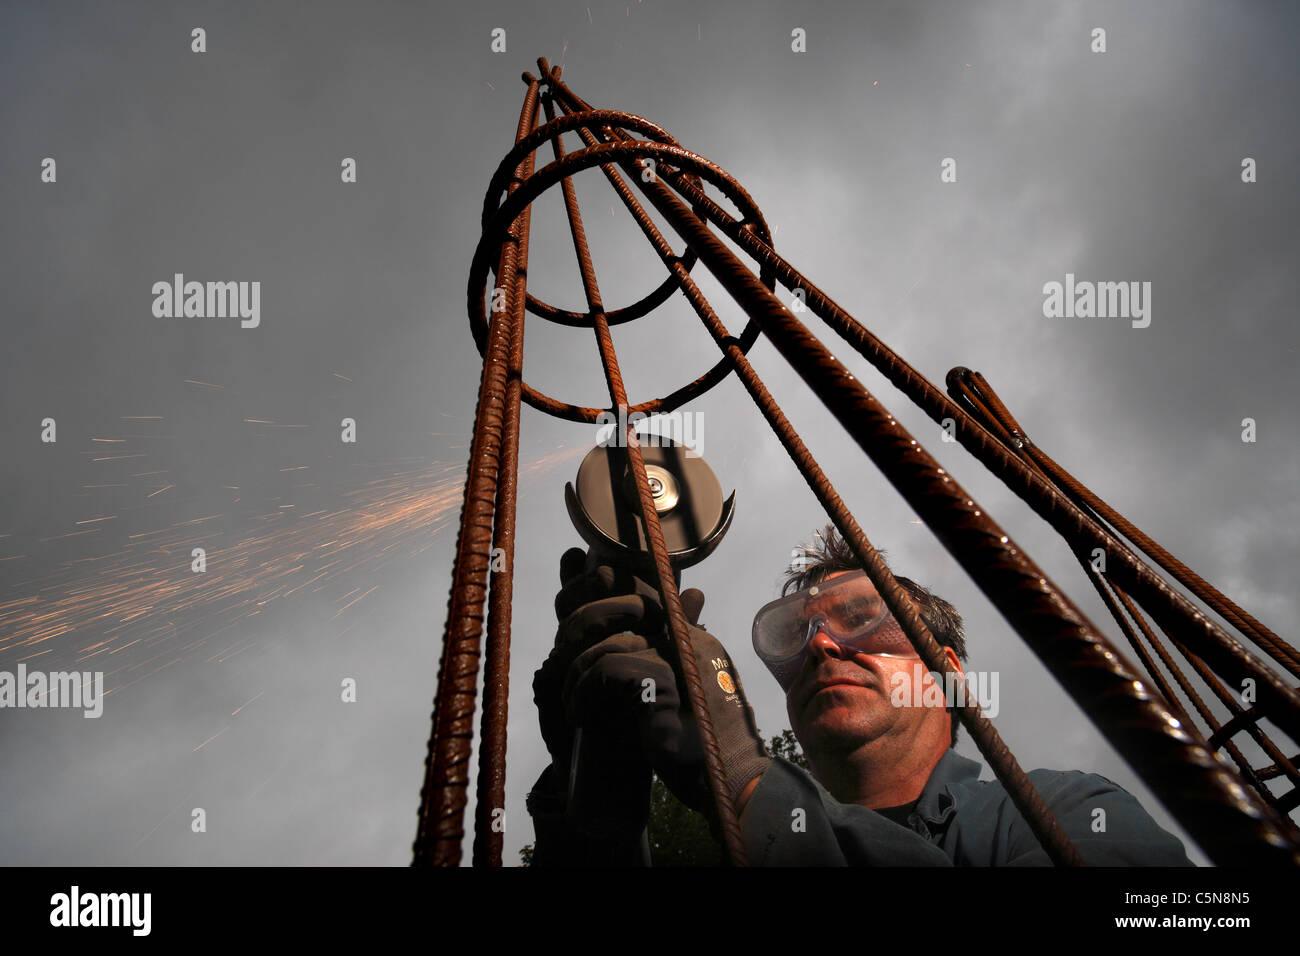 A steel fabricator making a plant obelisk Stock Photo